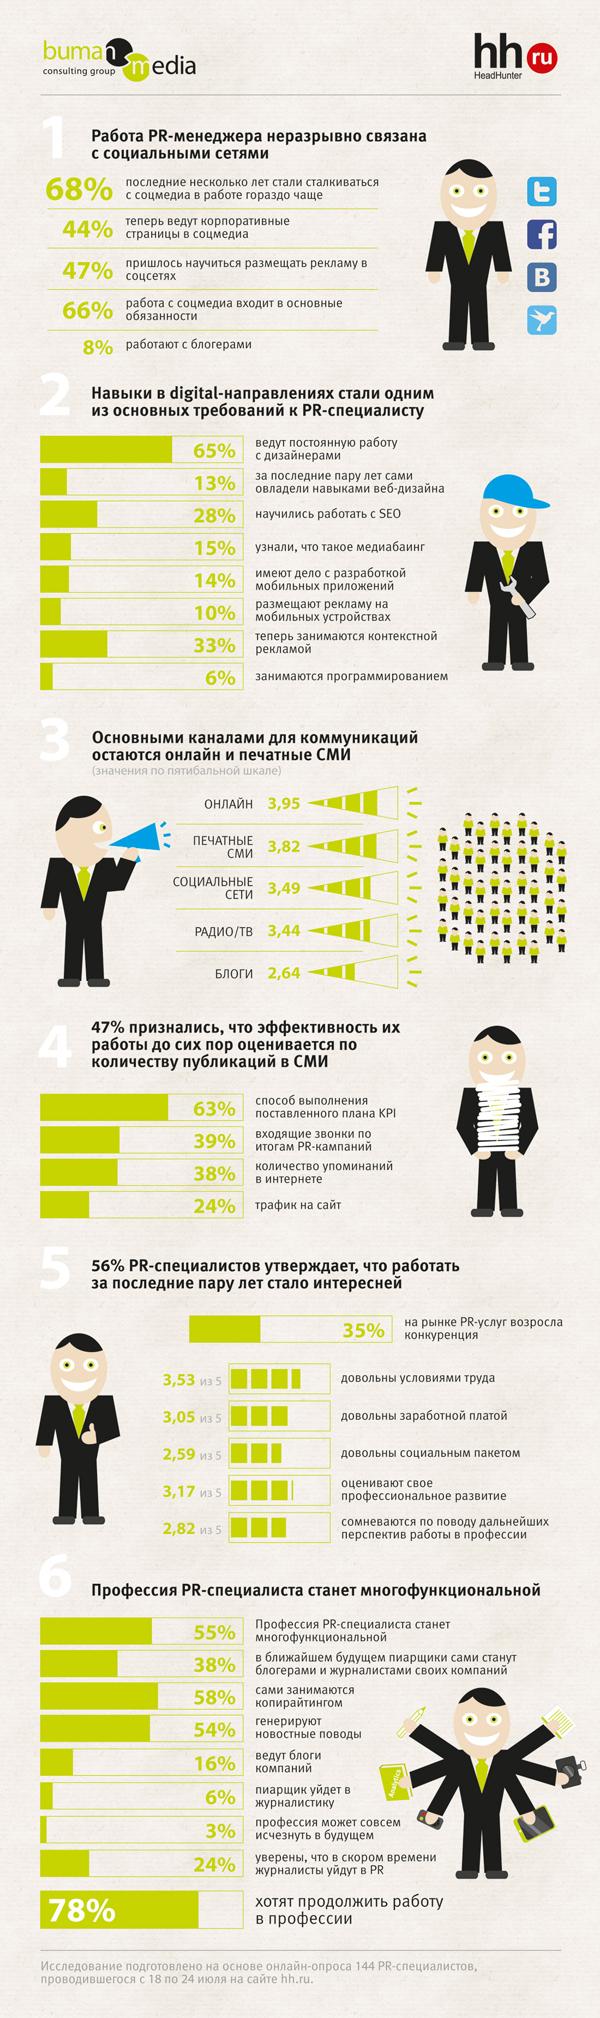 Infographic resume public relations